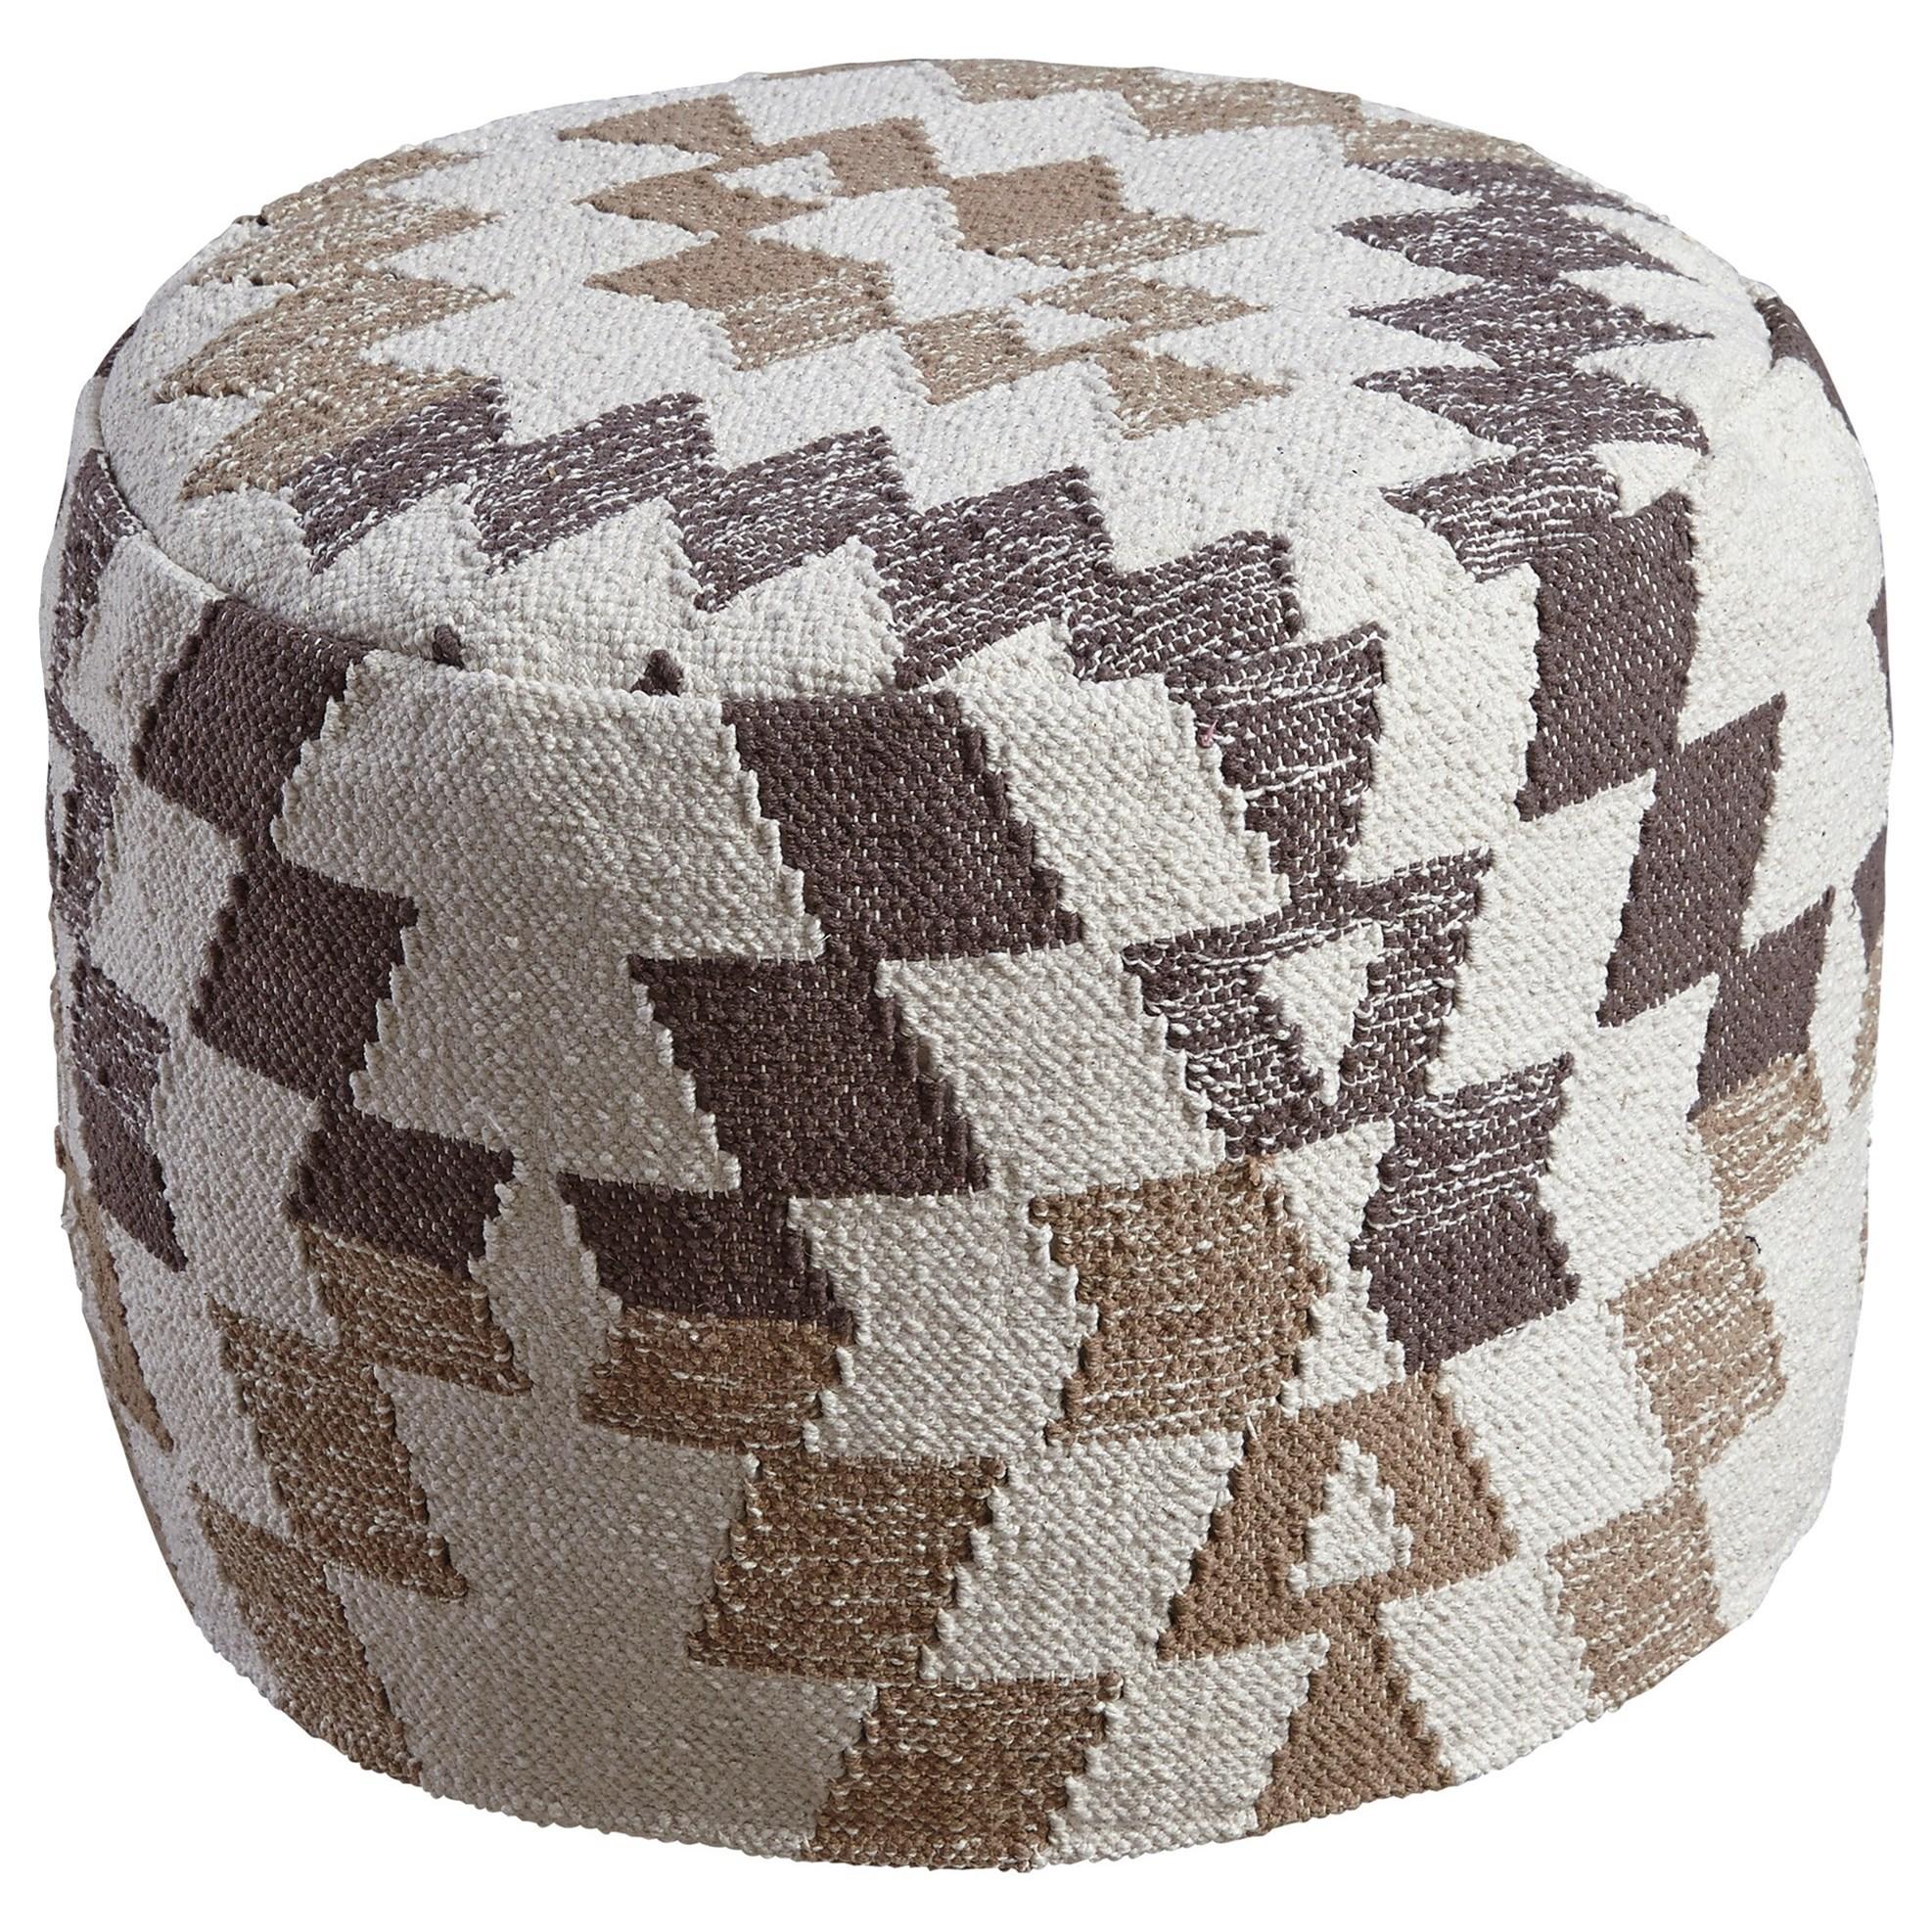 ashley signature design poufs a1000383 abraham white brown. Black Bedroom Furniture Sets. Home Design Ideas